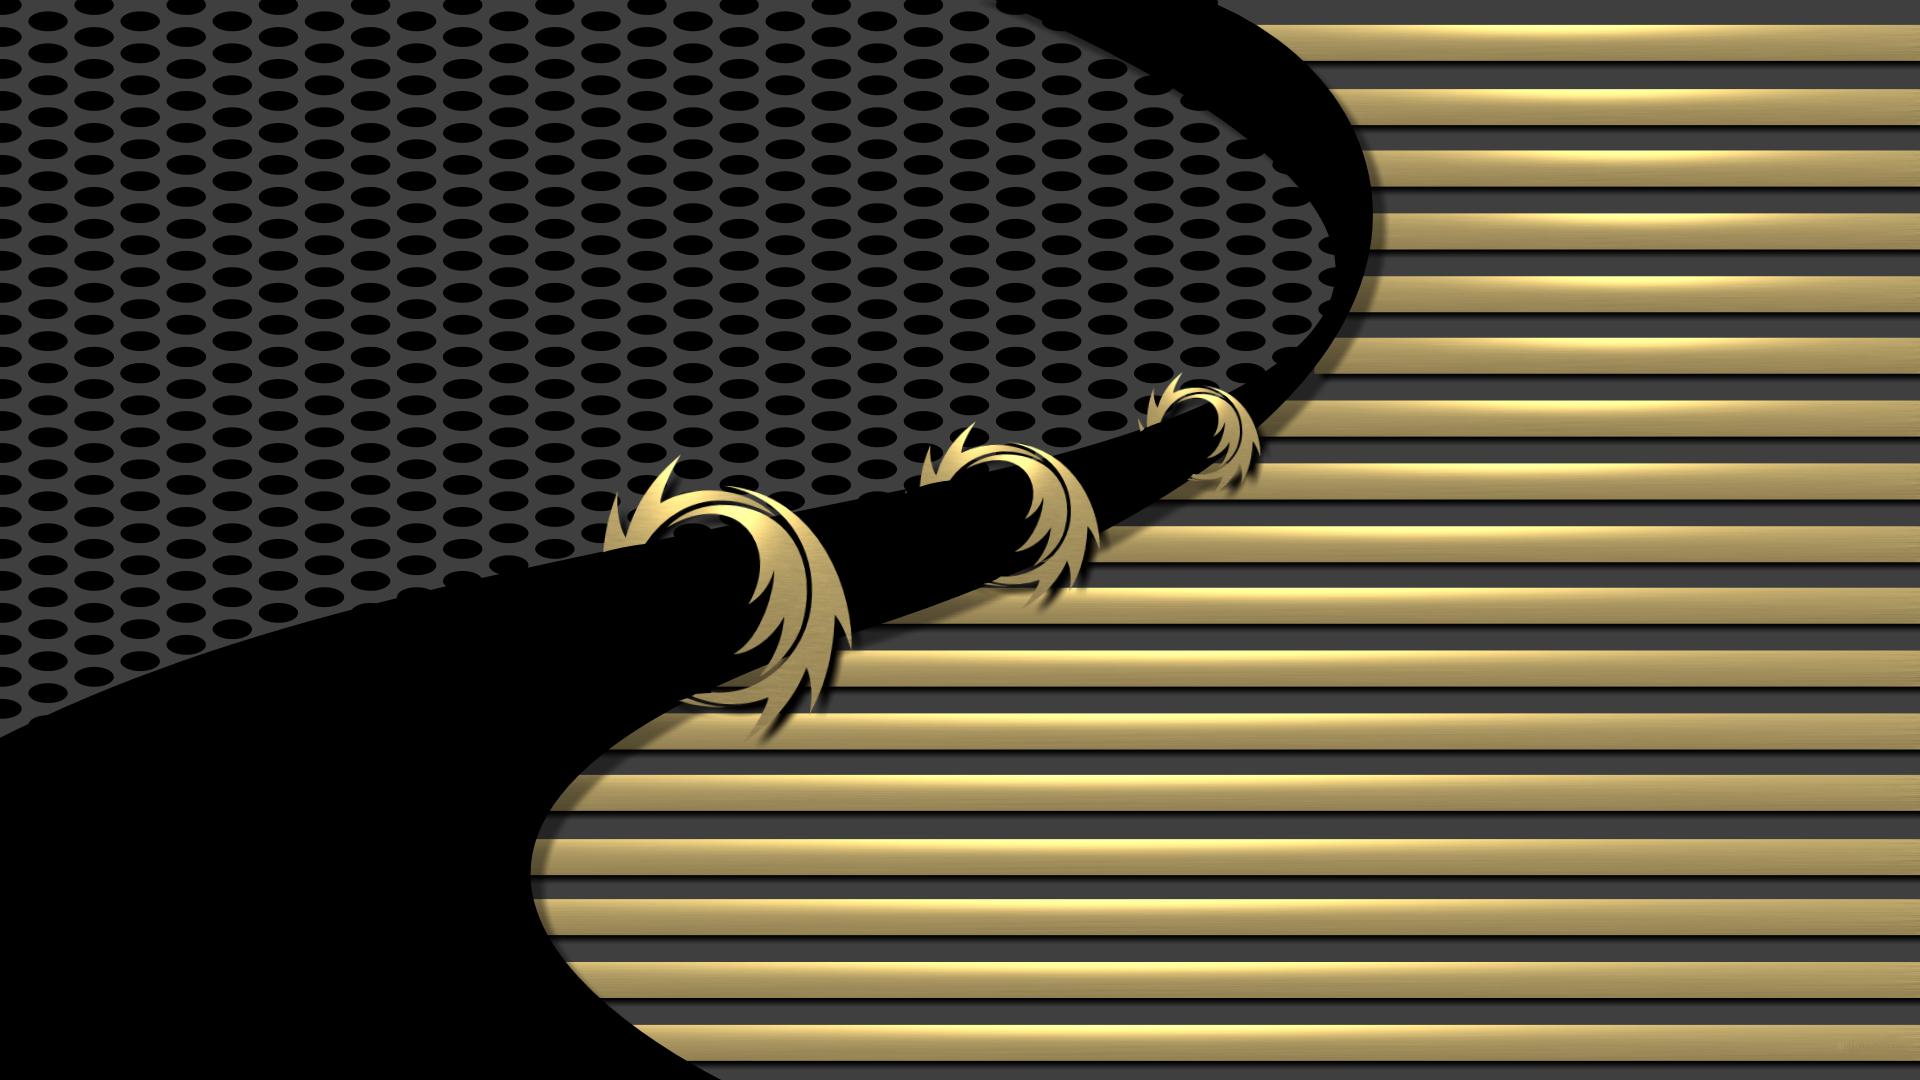 Wallpaper Dice 3d Black And Gold 1920 X 1080 Full Hd